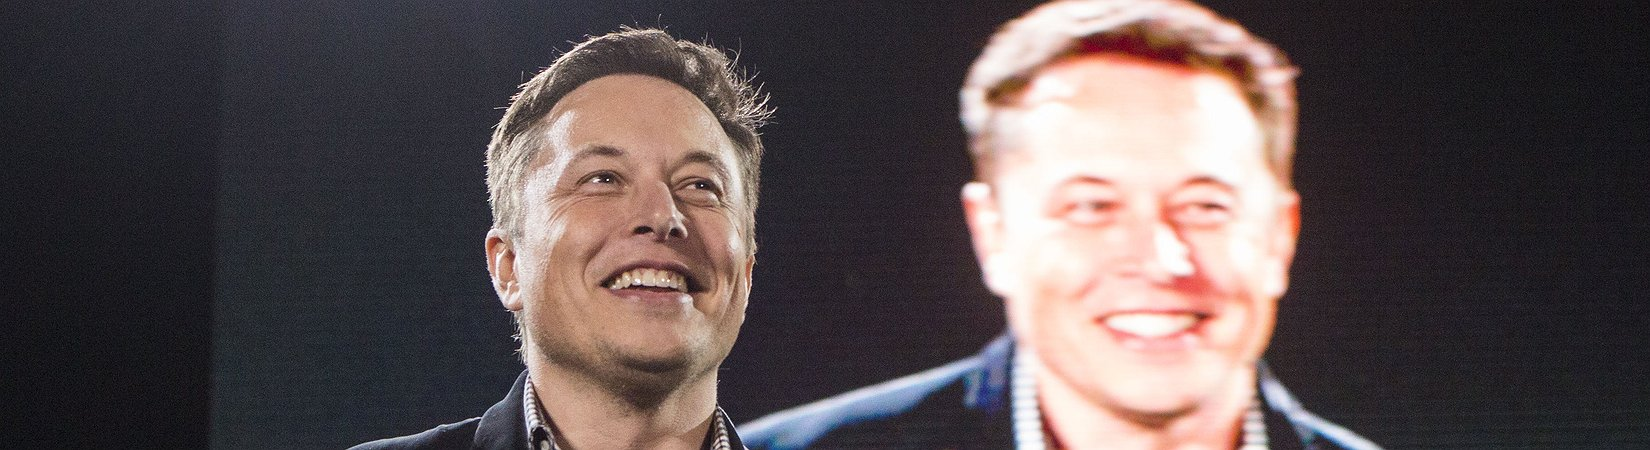 Илон Маск: Tesla станет дороже Apple